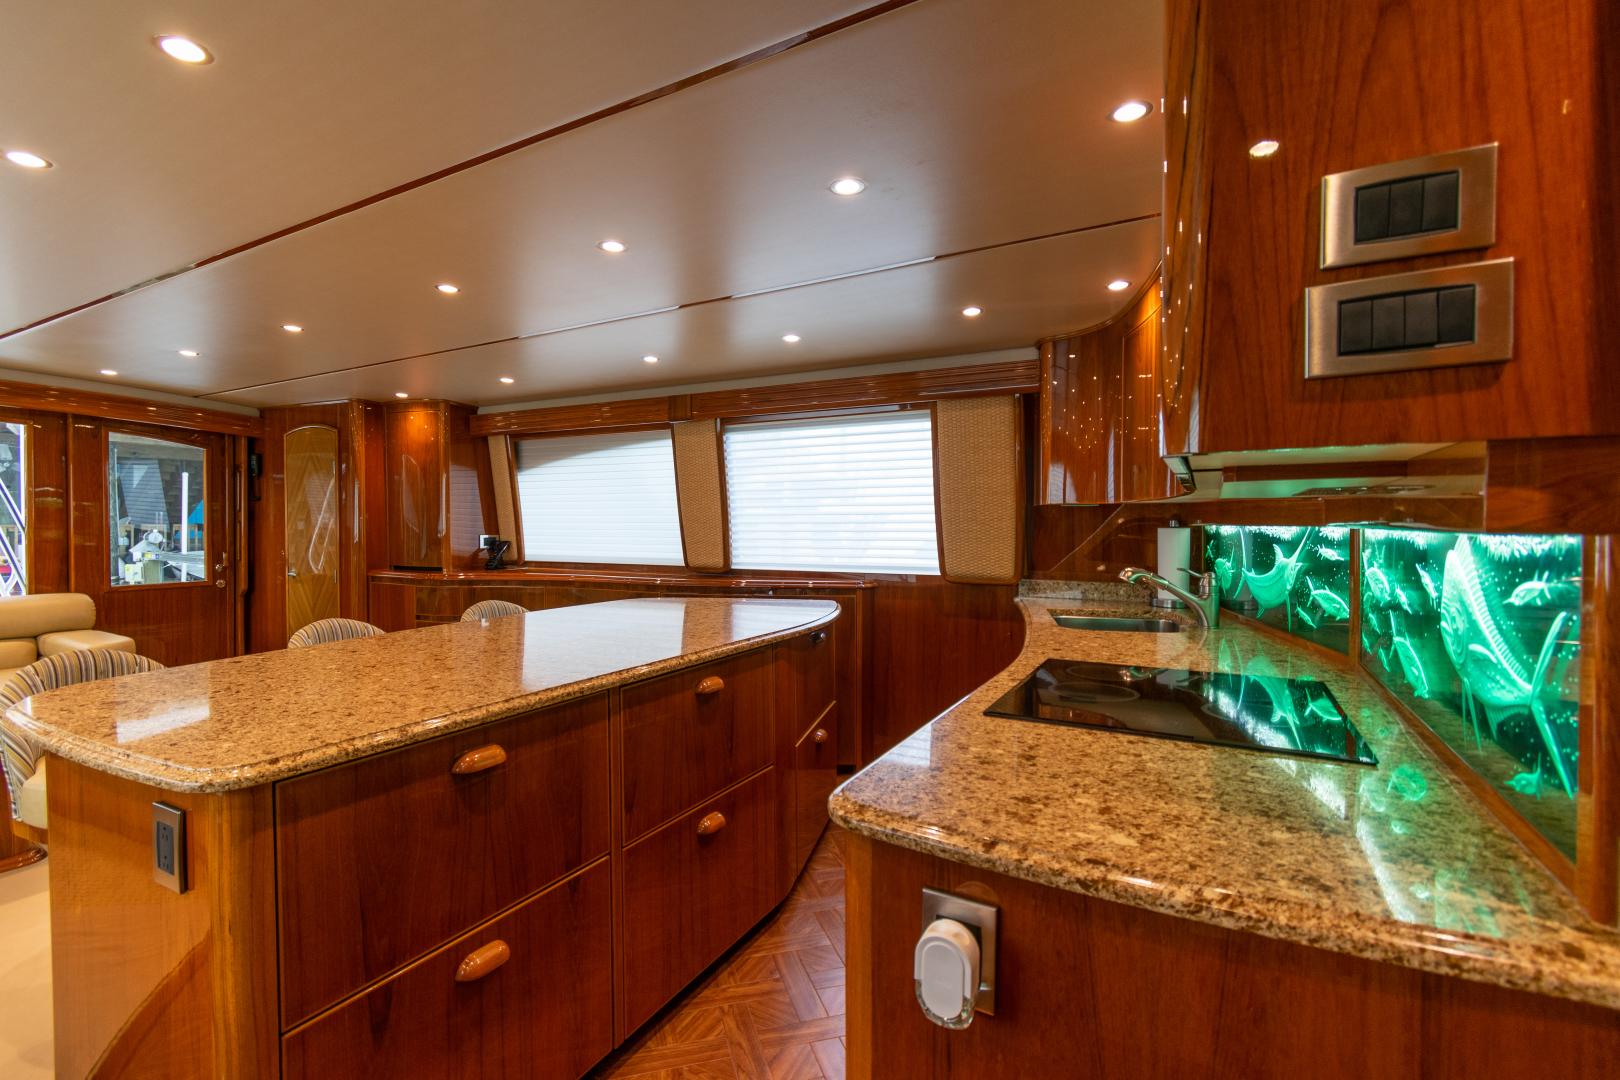 Viking-70 Convertible 2014-Load N Go Port Aransas-Texas-United States-2014 70 Viking Load N Go Galley (1)-1380508 | Thumbnail